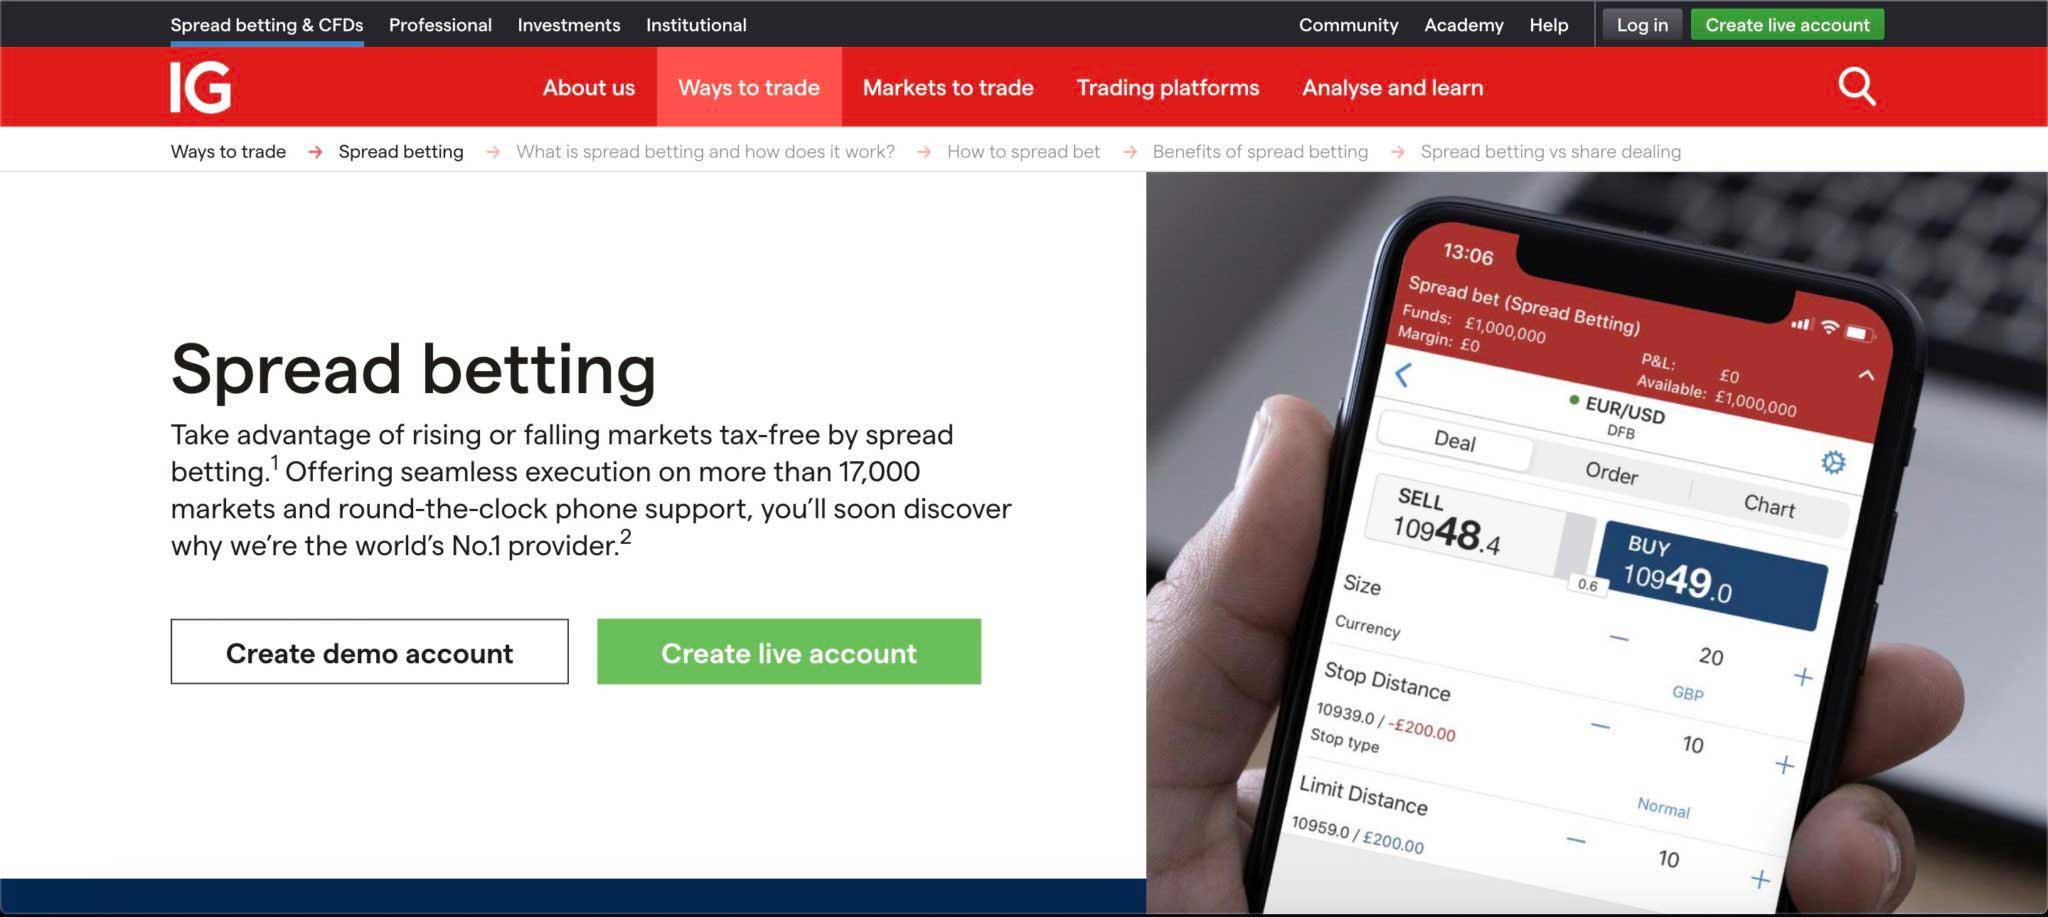 IG UK Spread betting